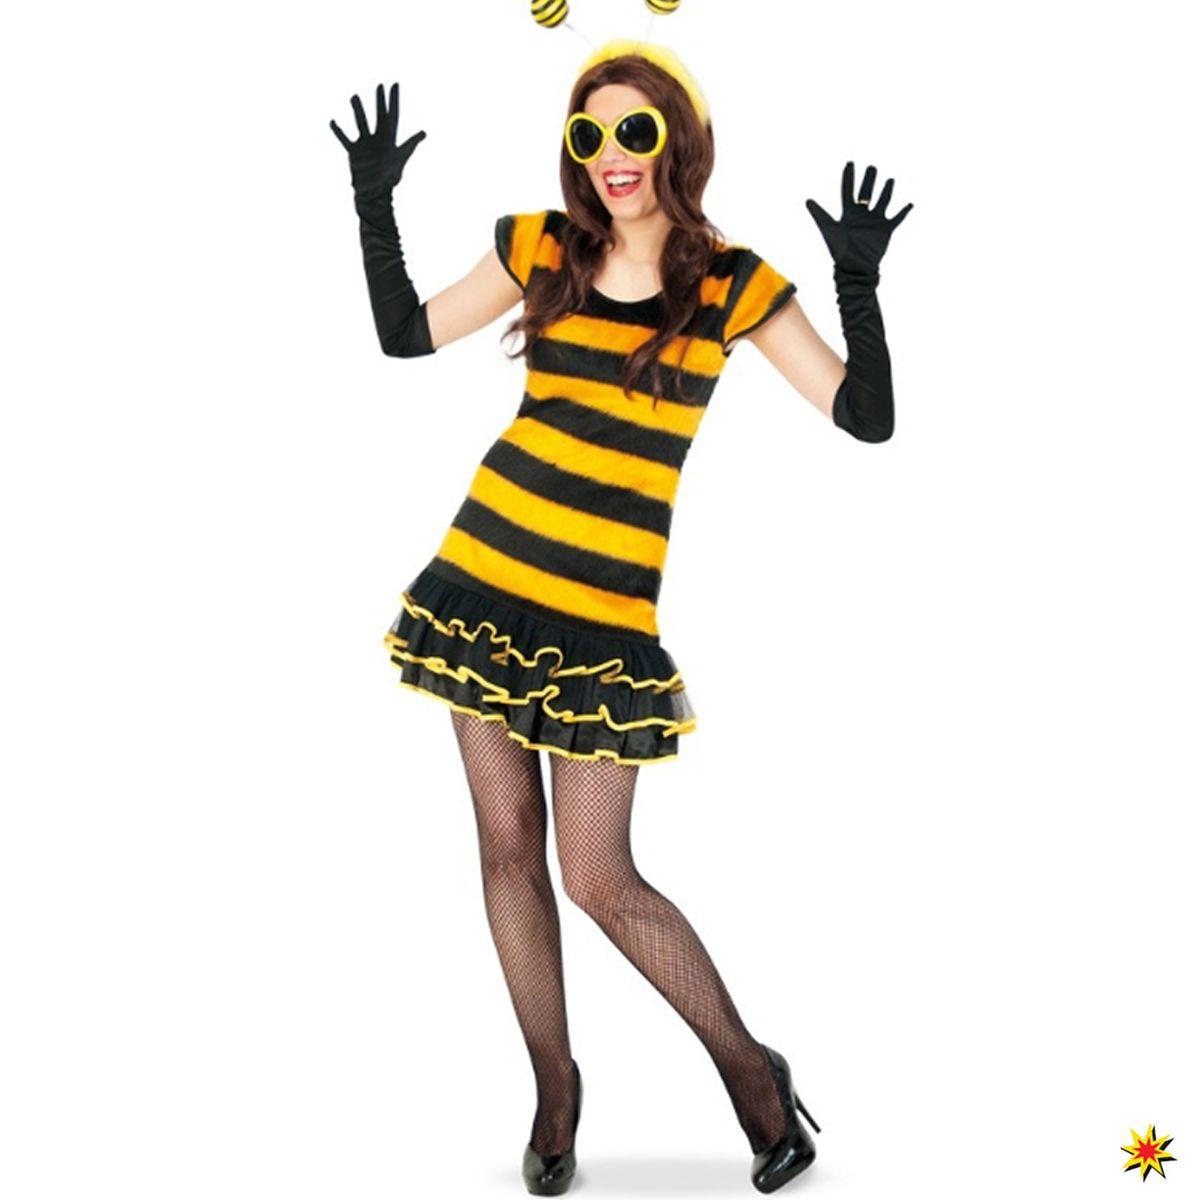 Damen Kostüm Biene Sunny Kleid Tier schwarz gelb Hummel Fasching Karneval Mottoparty